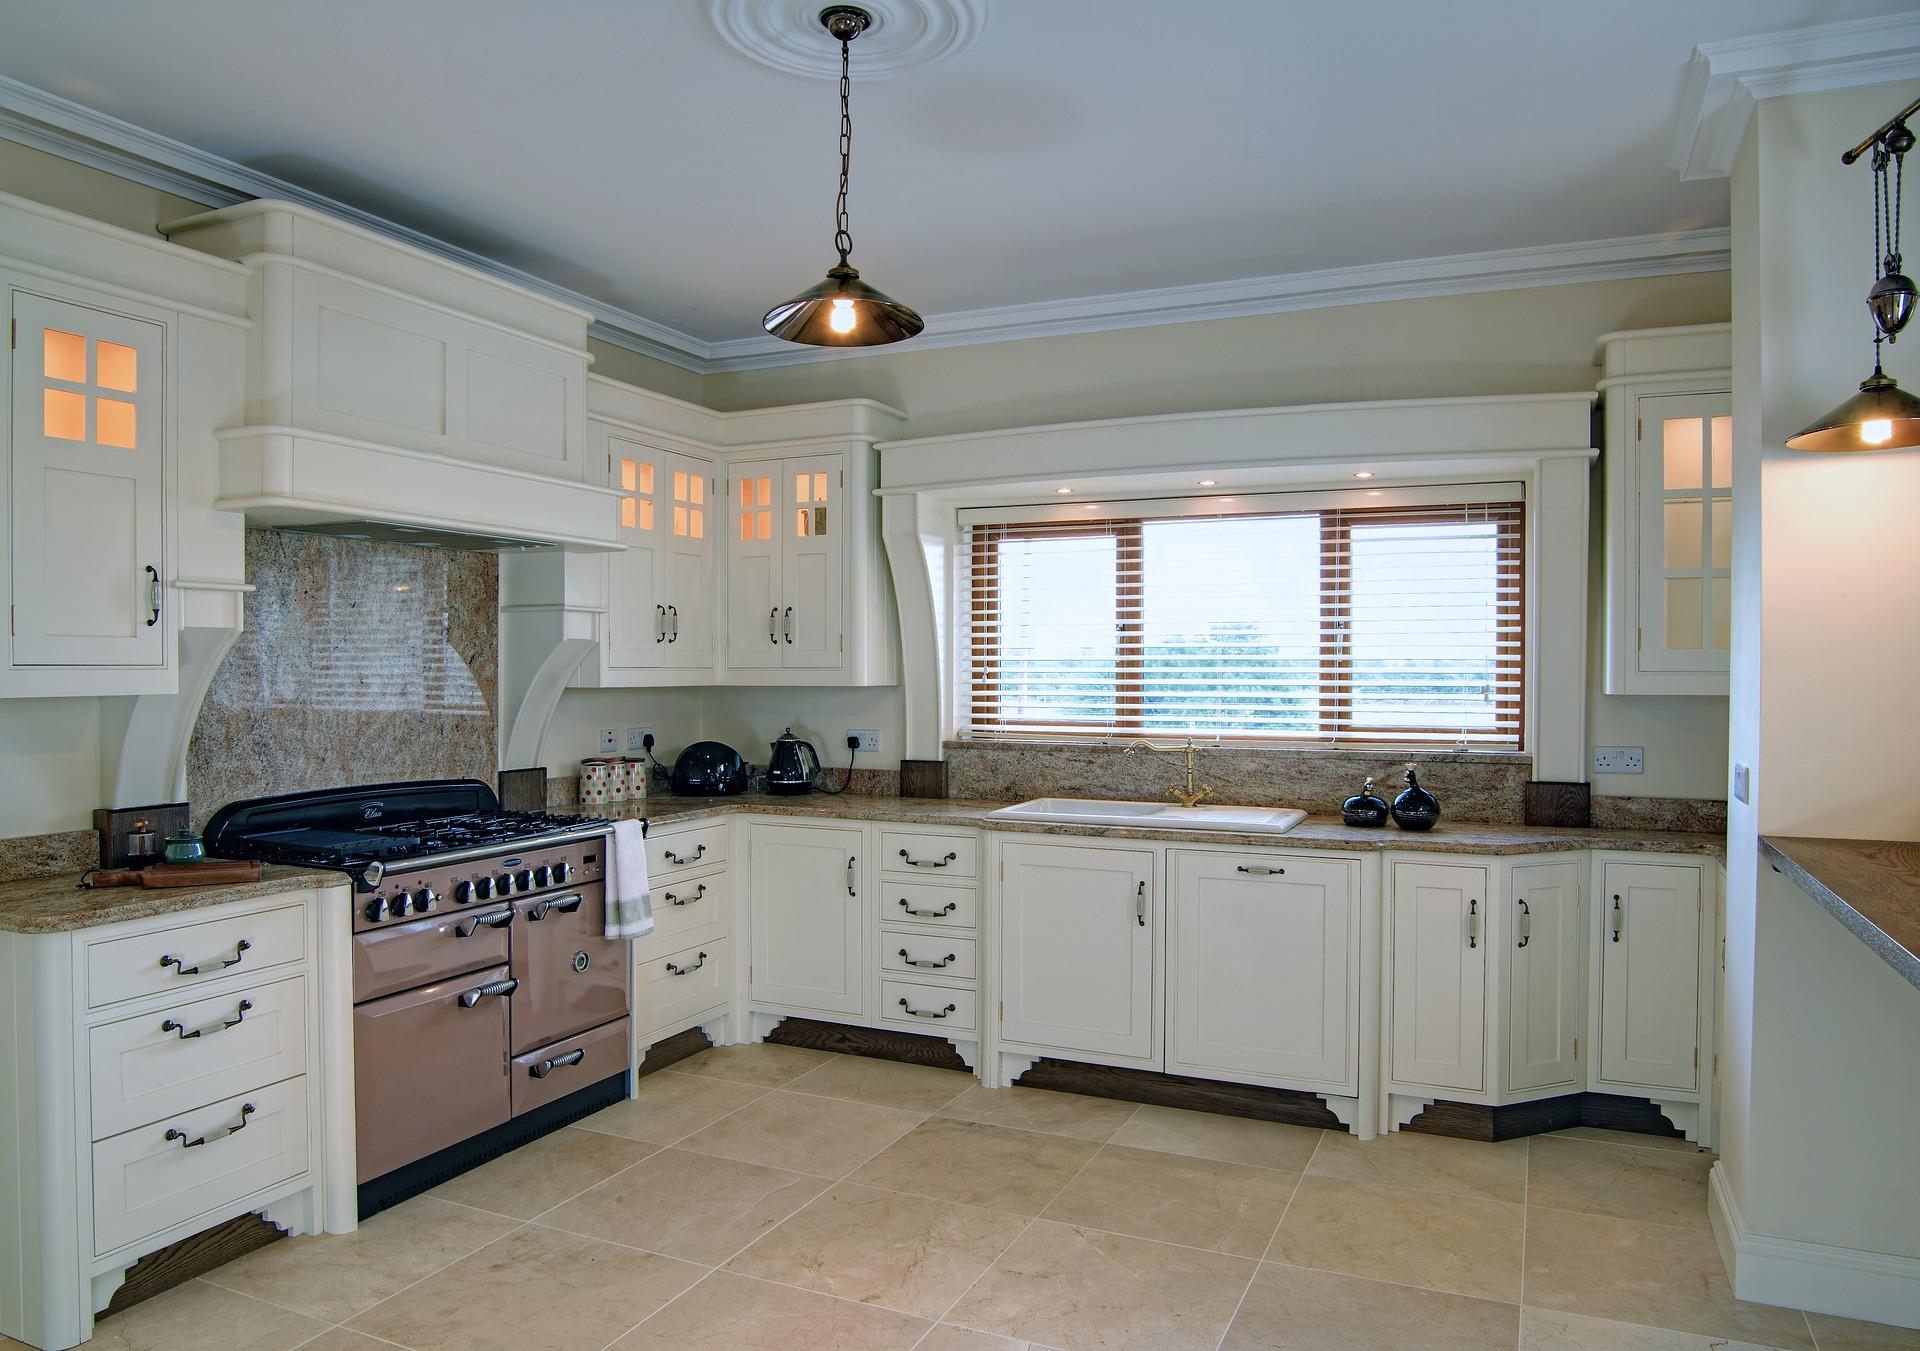 Beyaz renkli mutfak